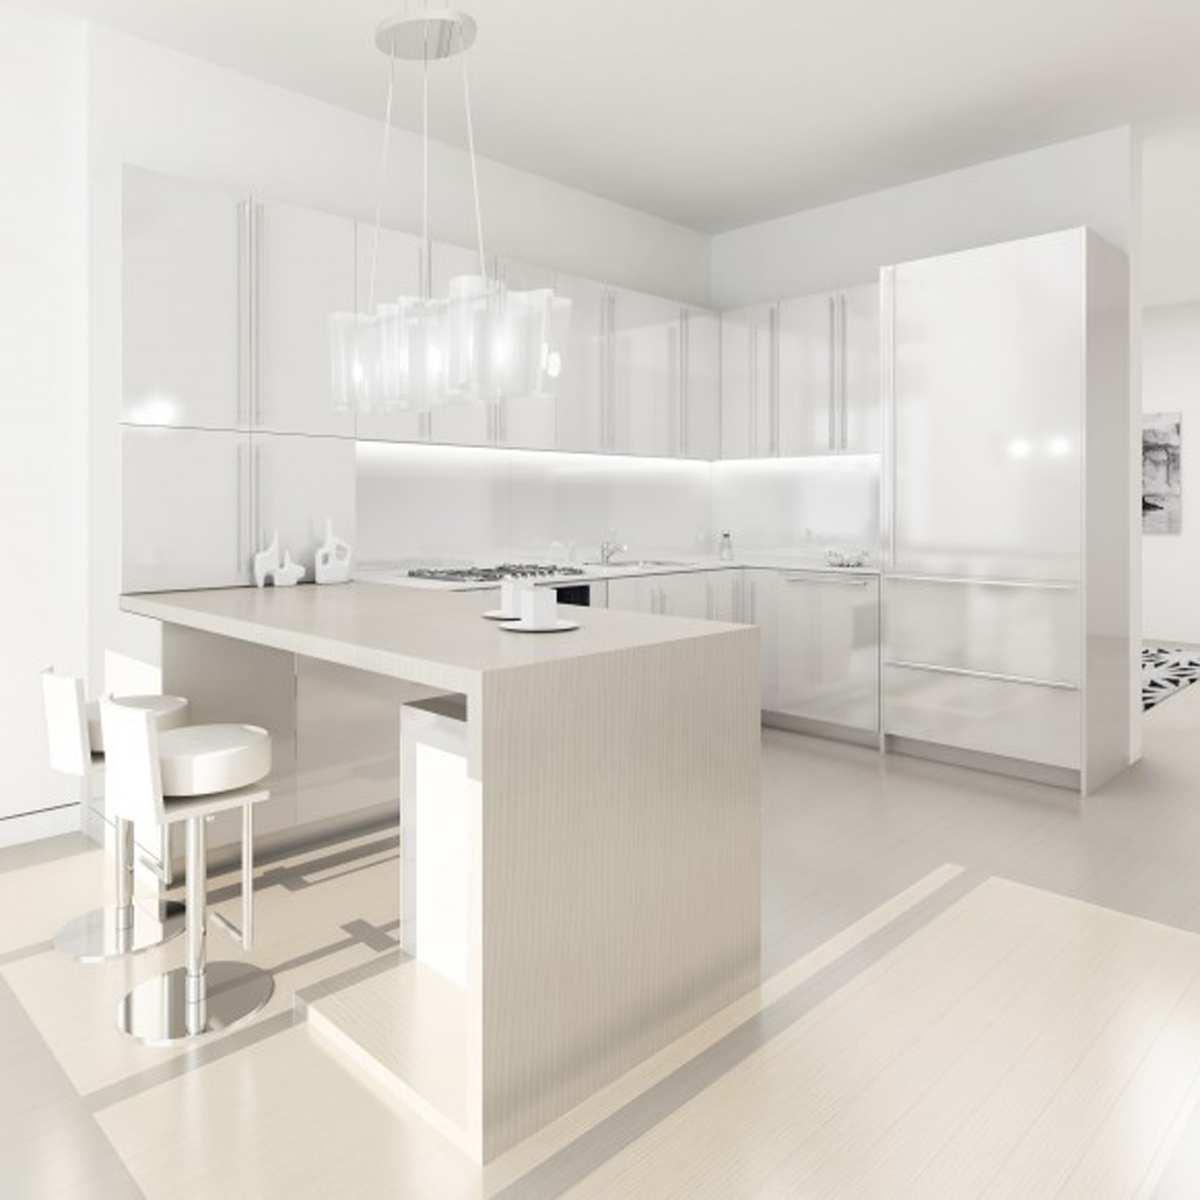 Modern Beadboard Cabinets in Glossy White Design